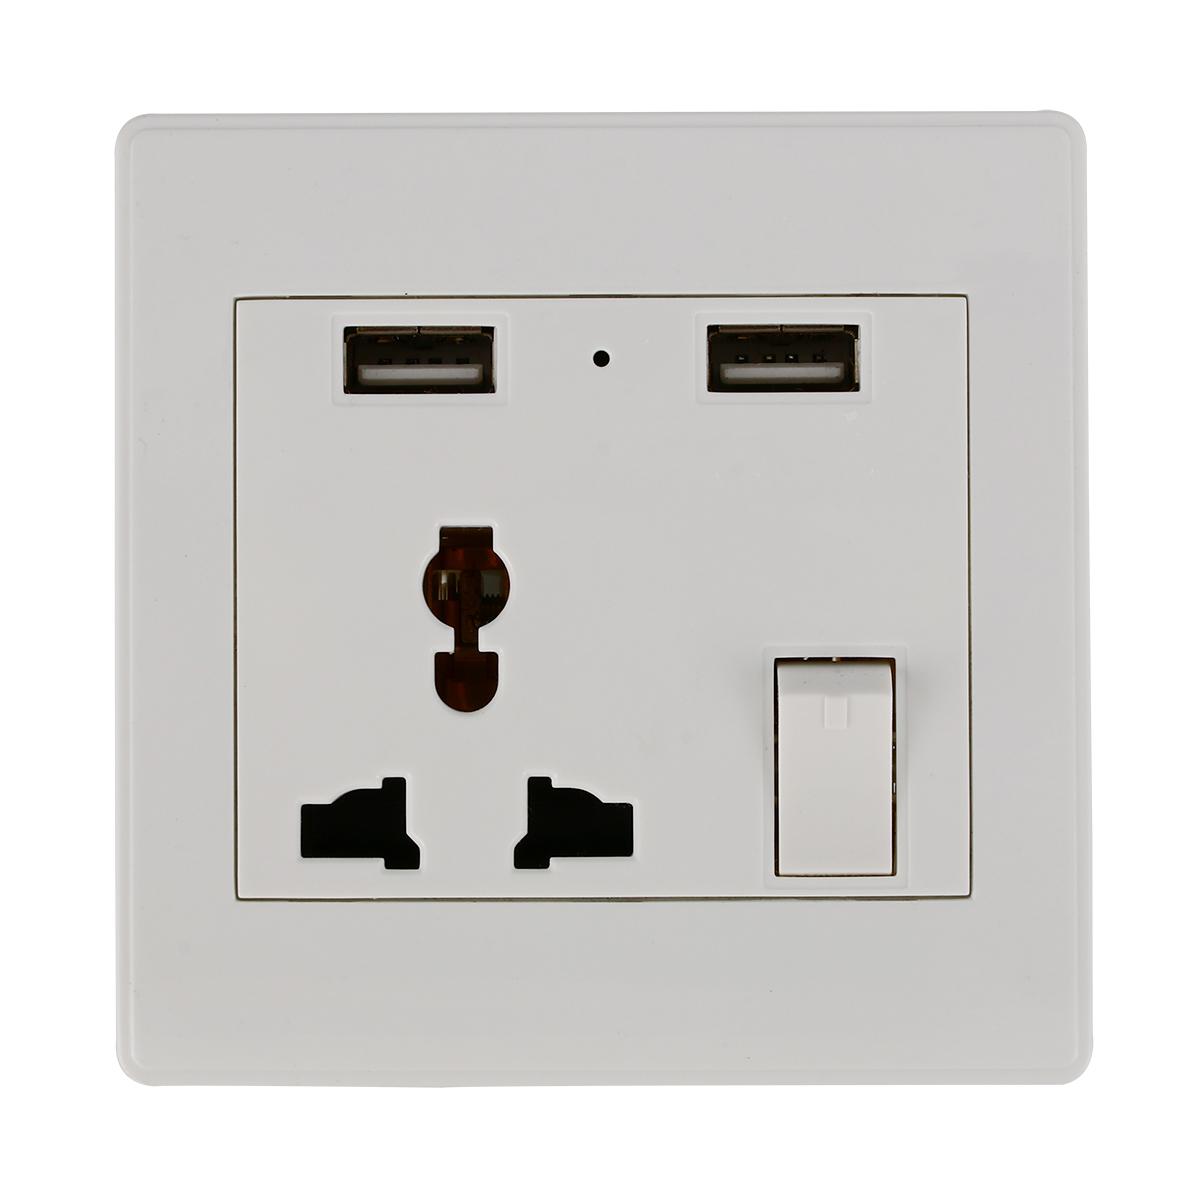 Wall Socket Dual 2 USB Plug Switch Power Supply Plate Universal 2100mA Charger BI122(China (Mainland))